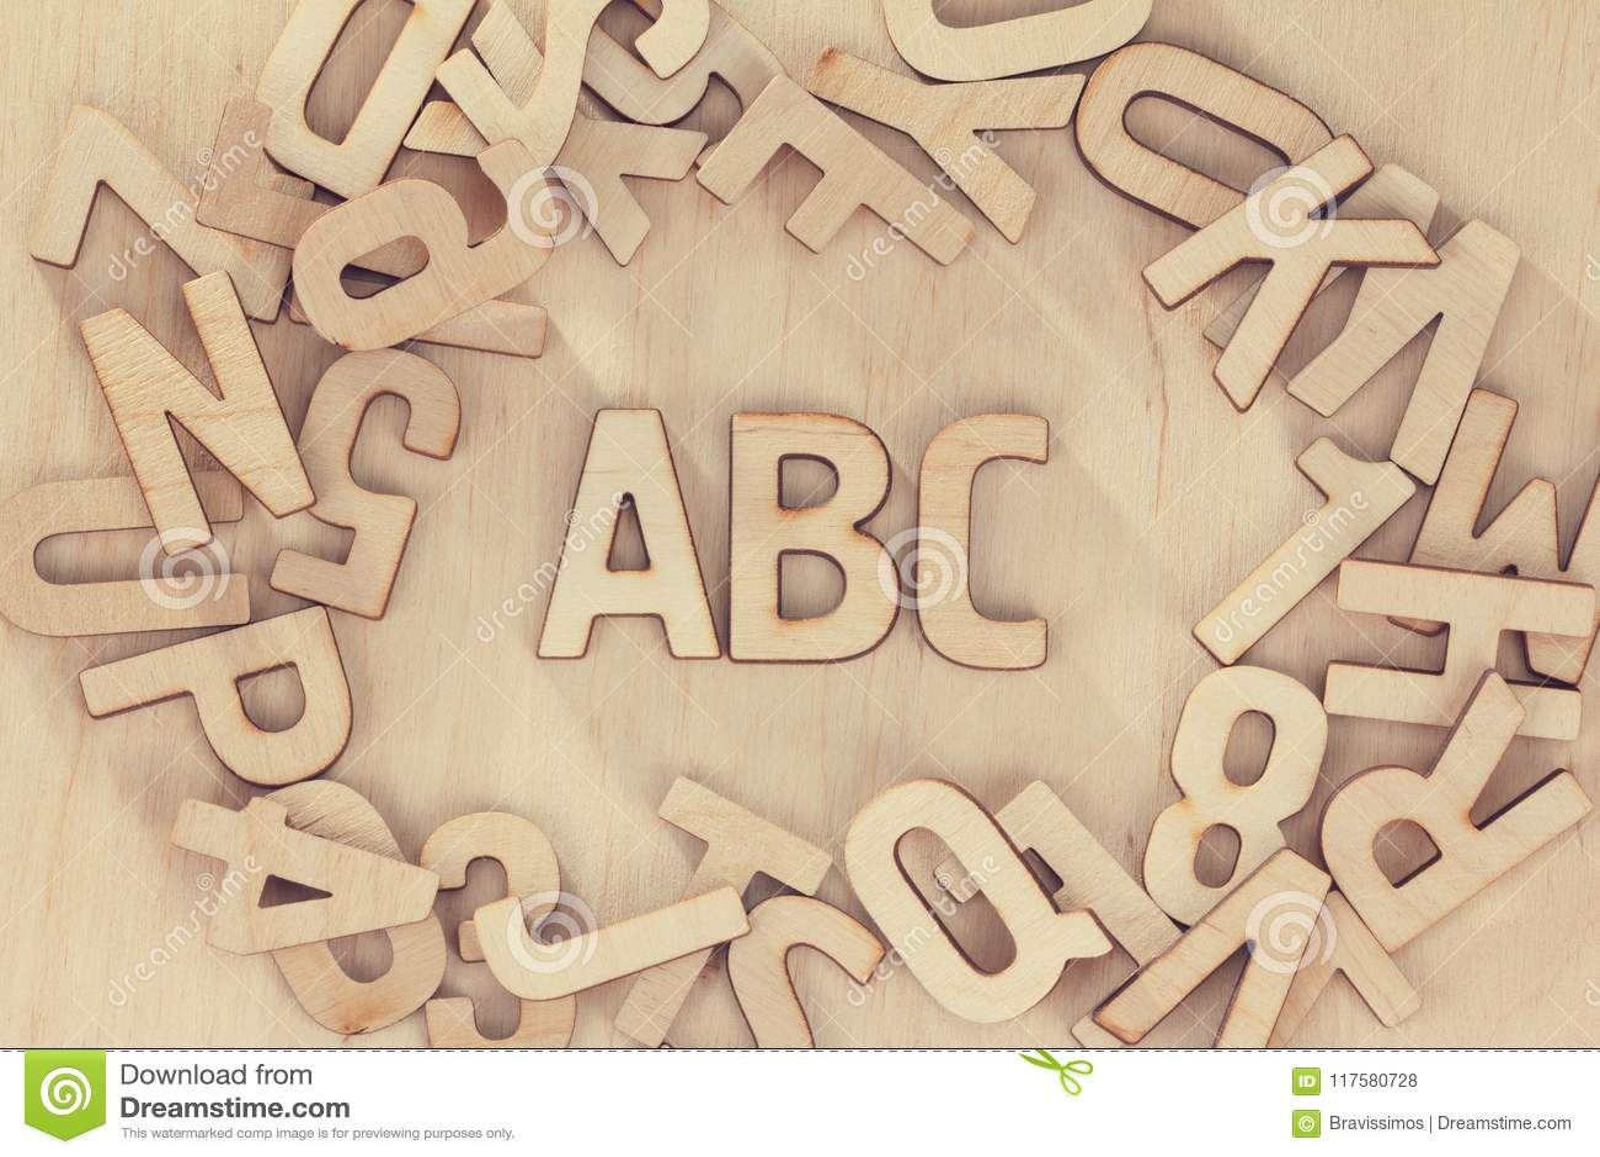 Alphabet Wooden Letters Set Symbols Wood Background Abc Education